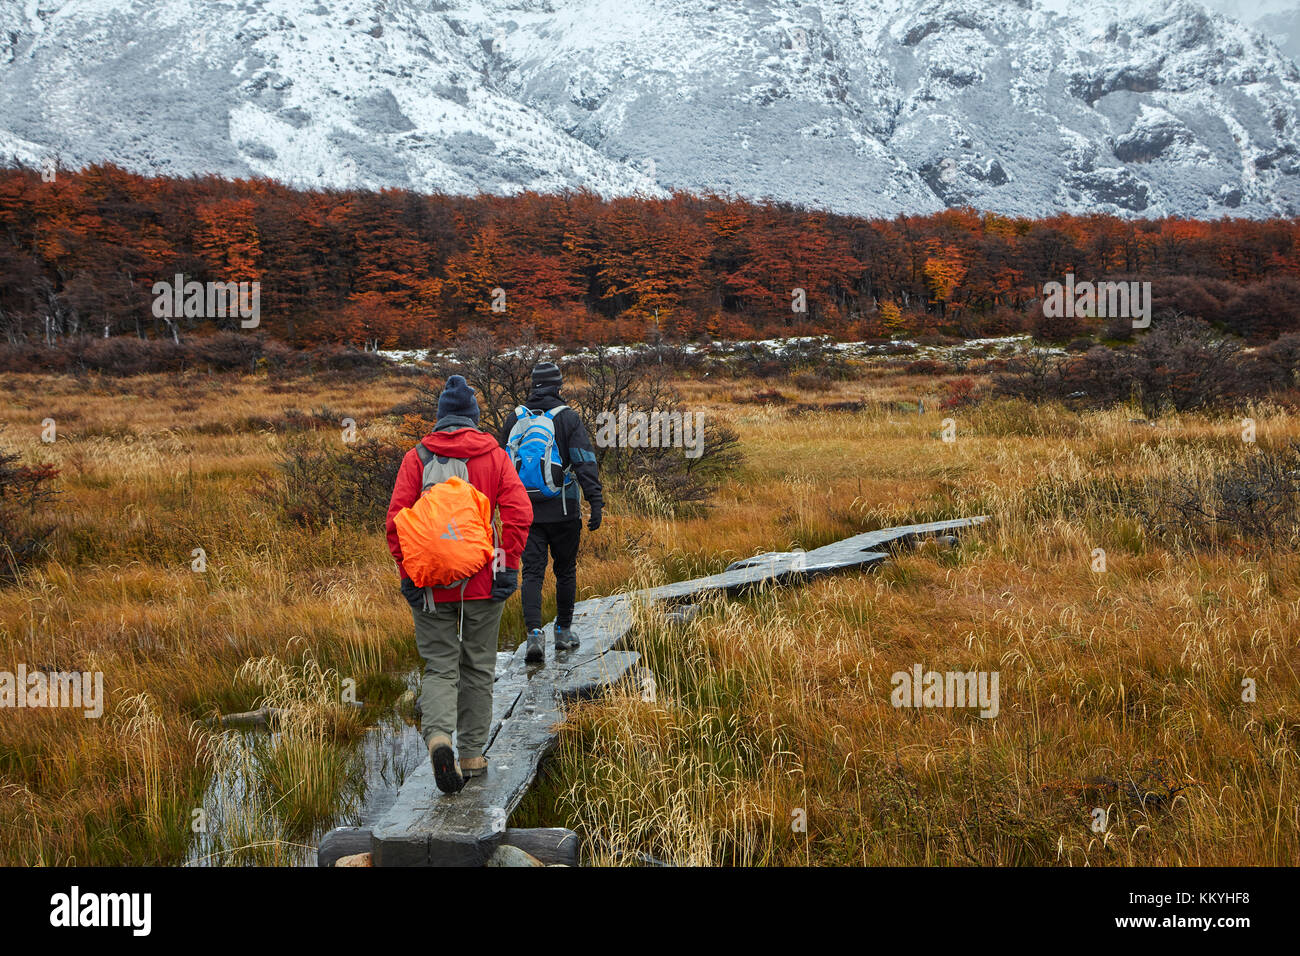 Wanderer auf der Promenade auf dem Weg zur Laguna de los Tres, Parque Nacional Los Glaciares (World Heritage Area), Stockbild